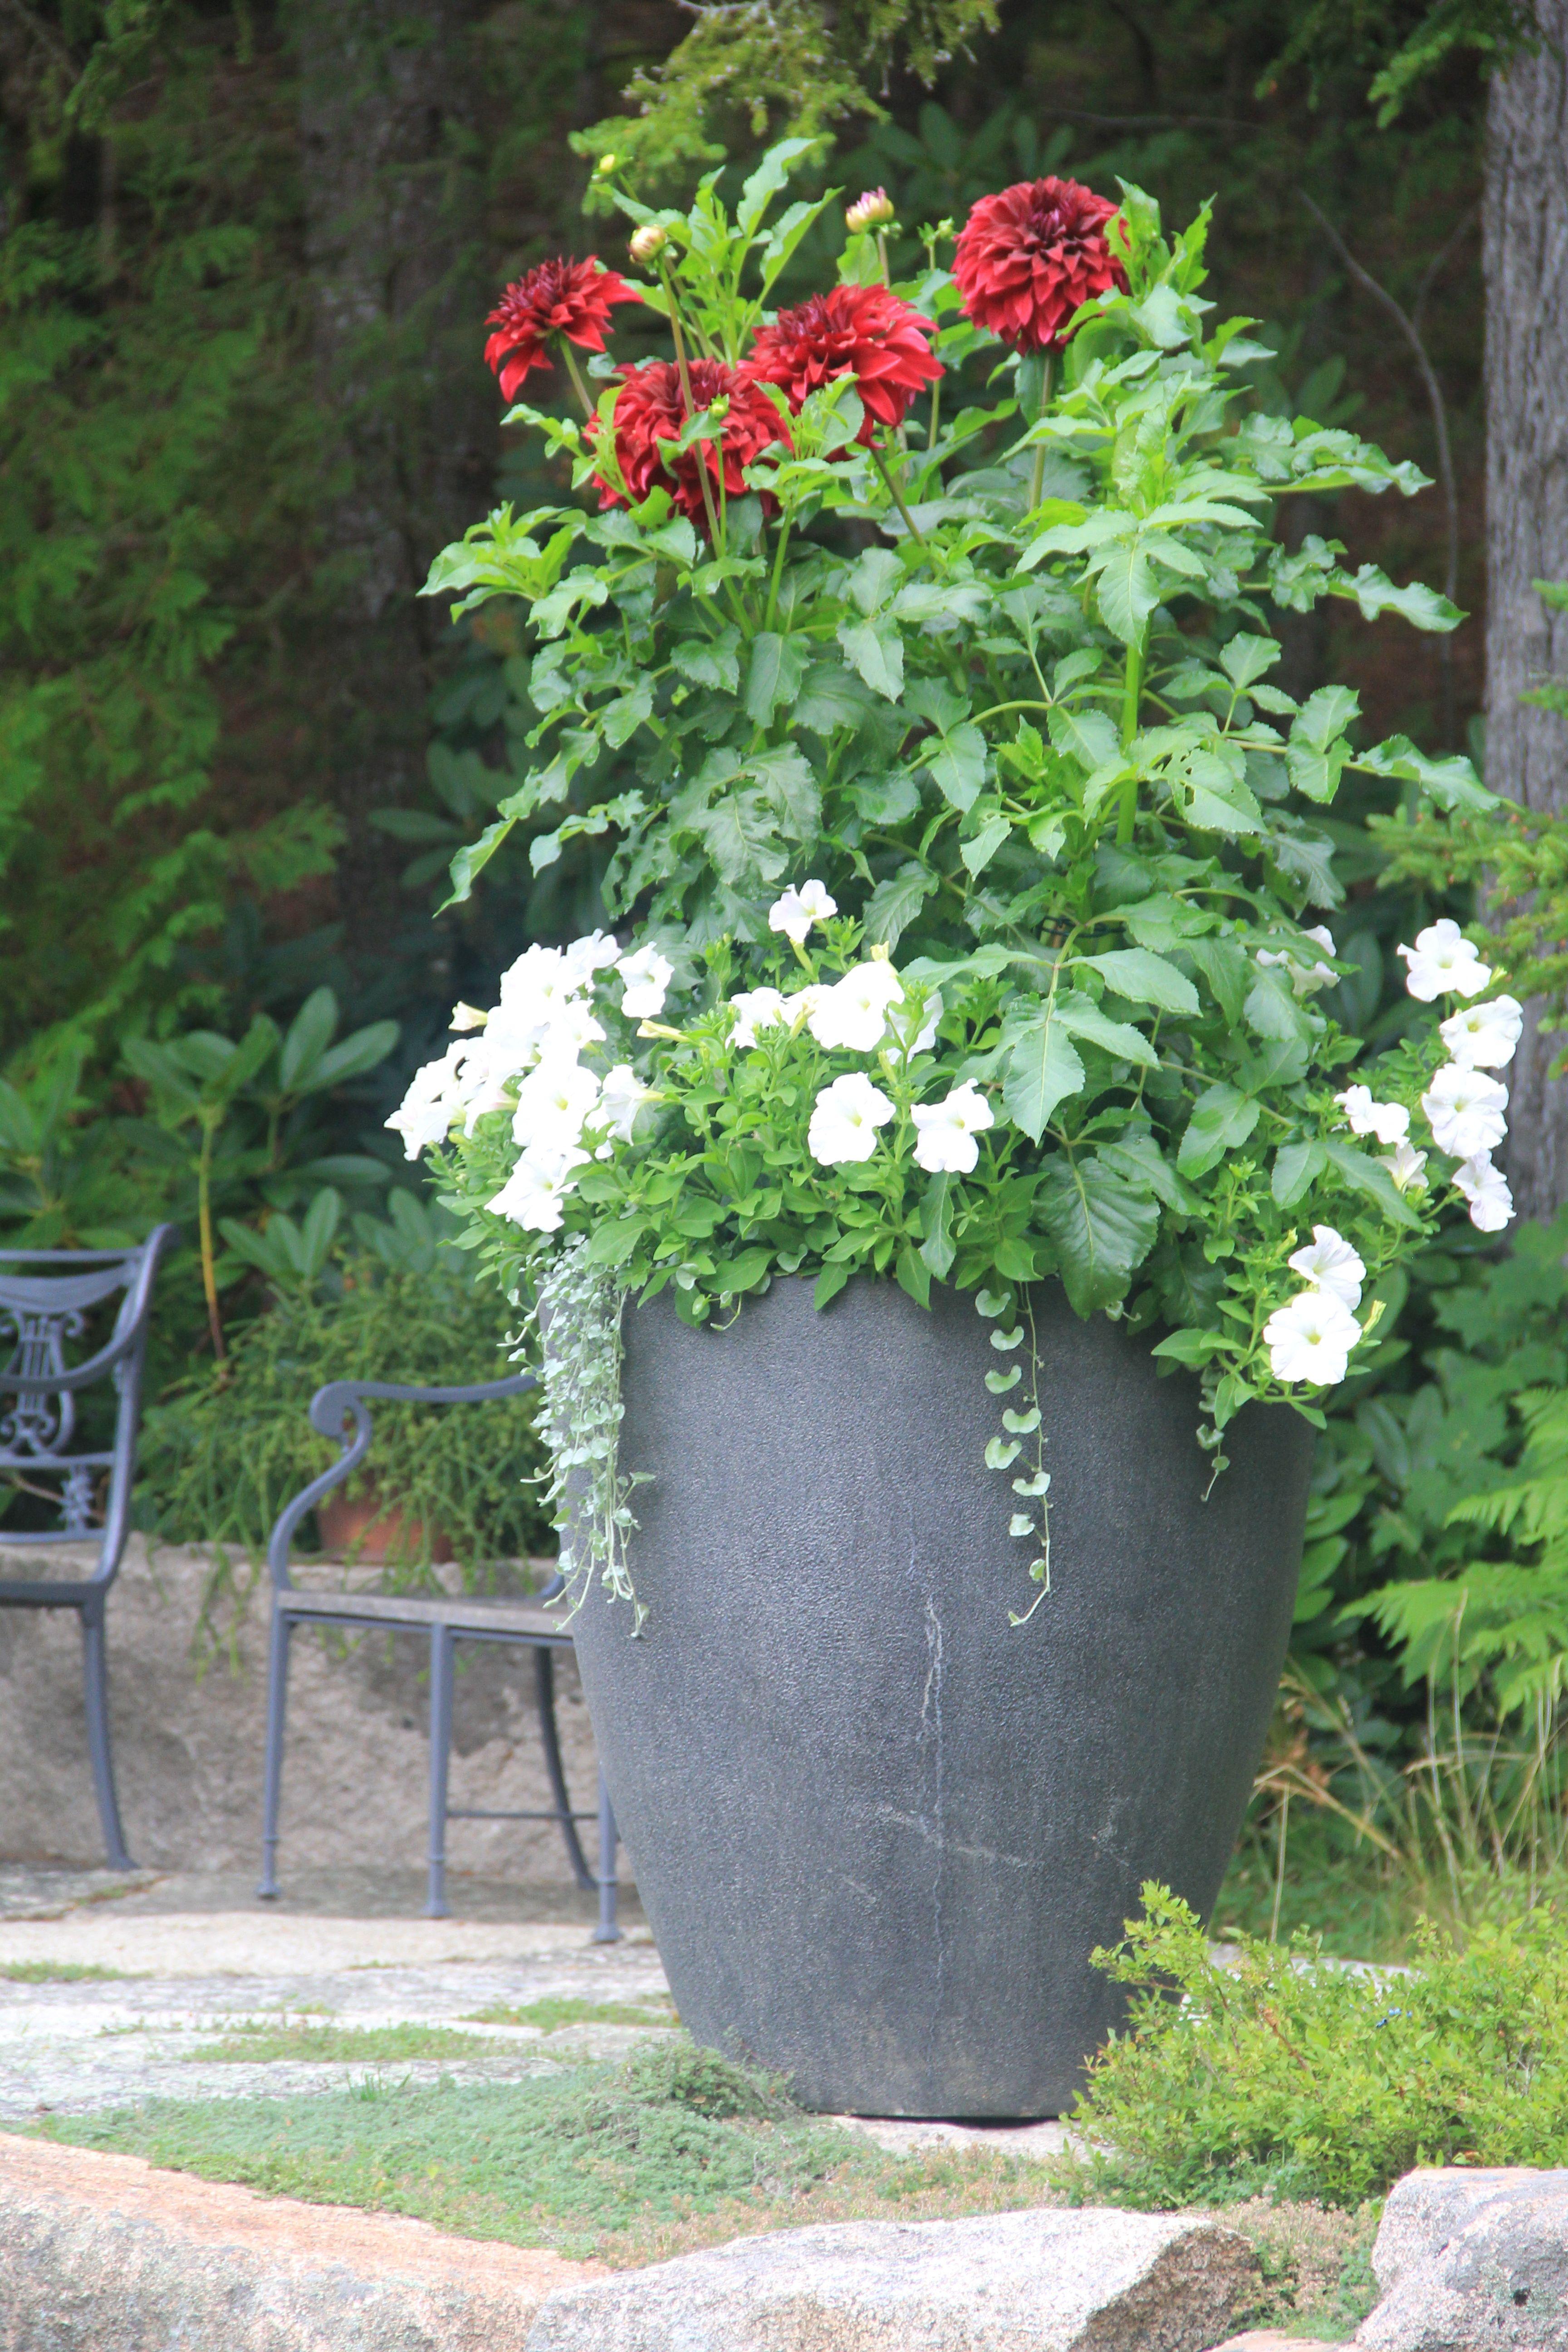 Thuya Garden | Land & Garden Preserve